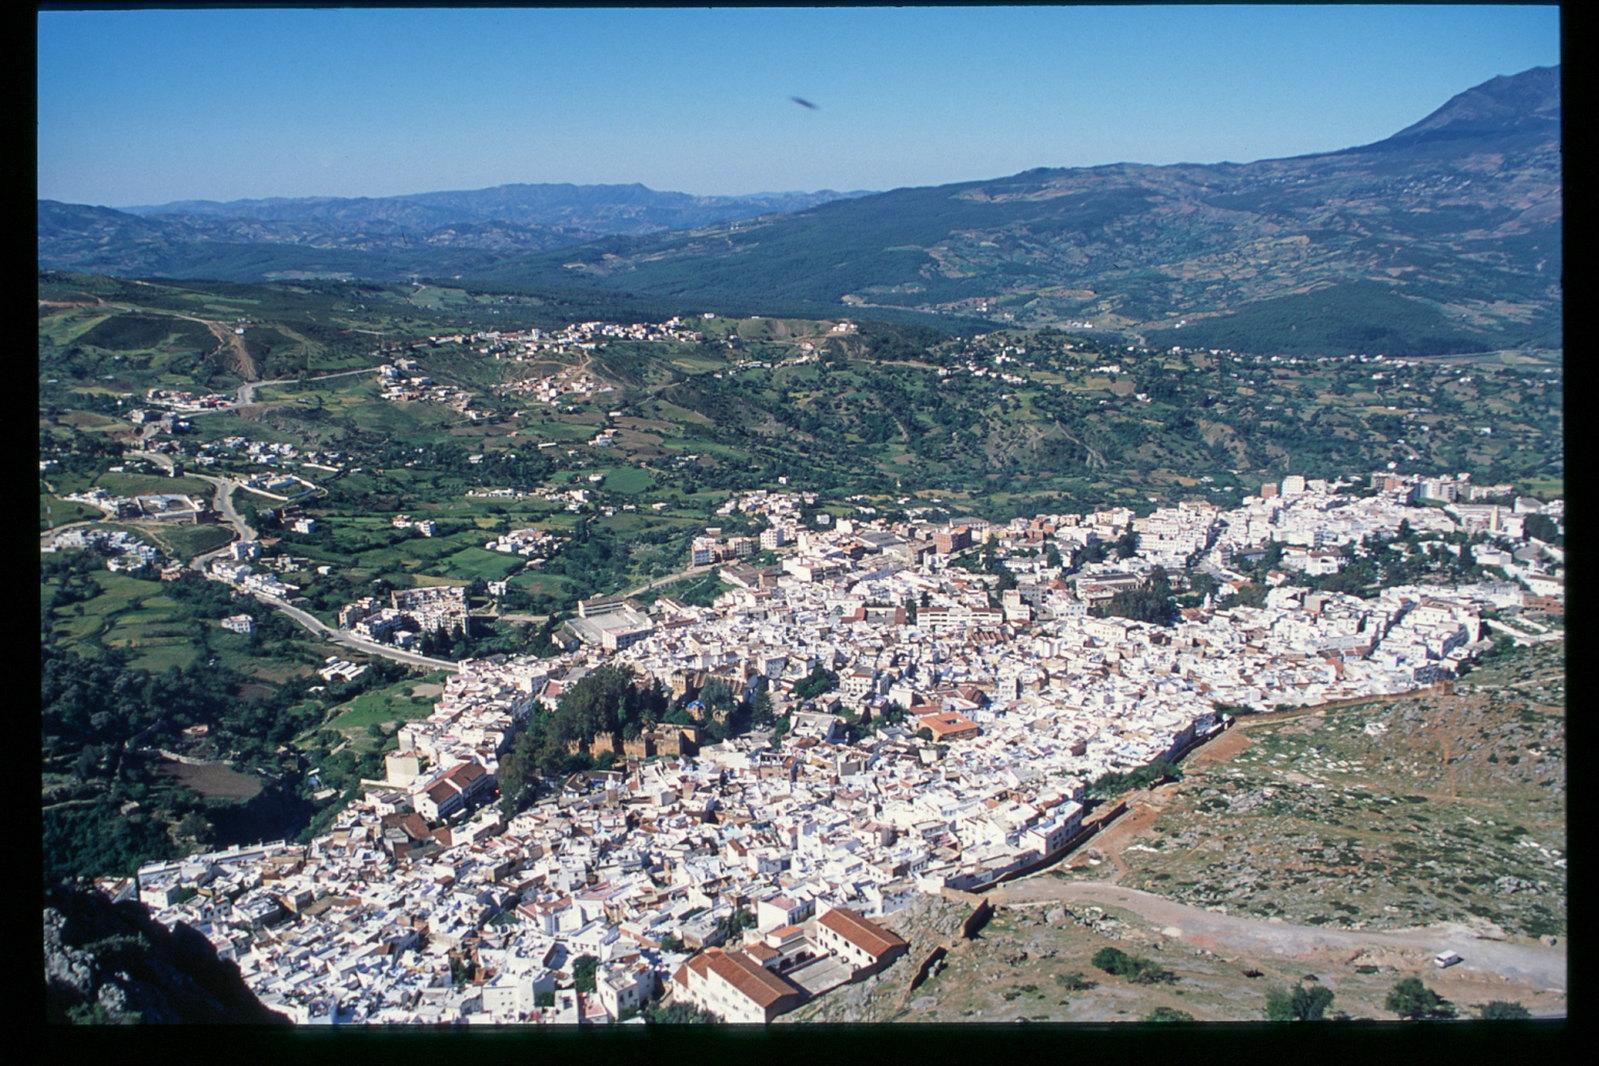 Maroc -Rif - Vue de haut de Chefchaouen